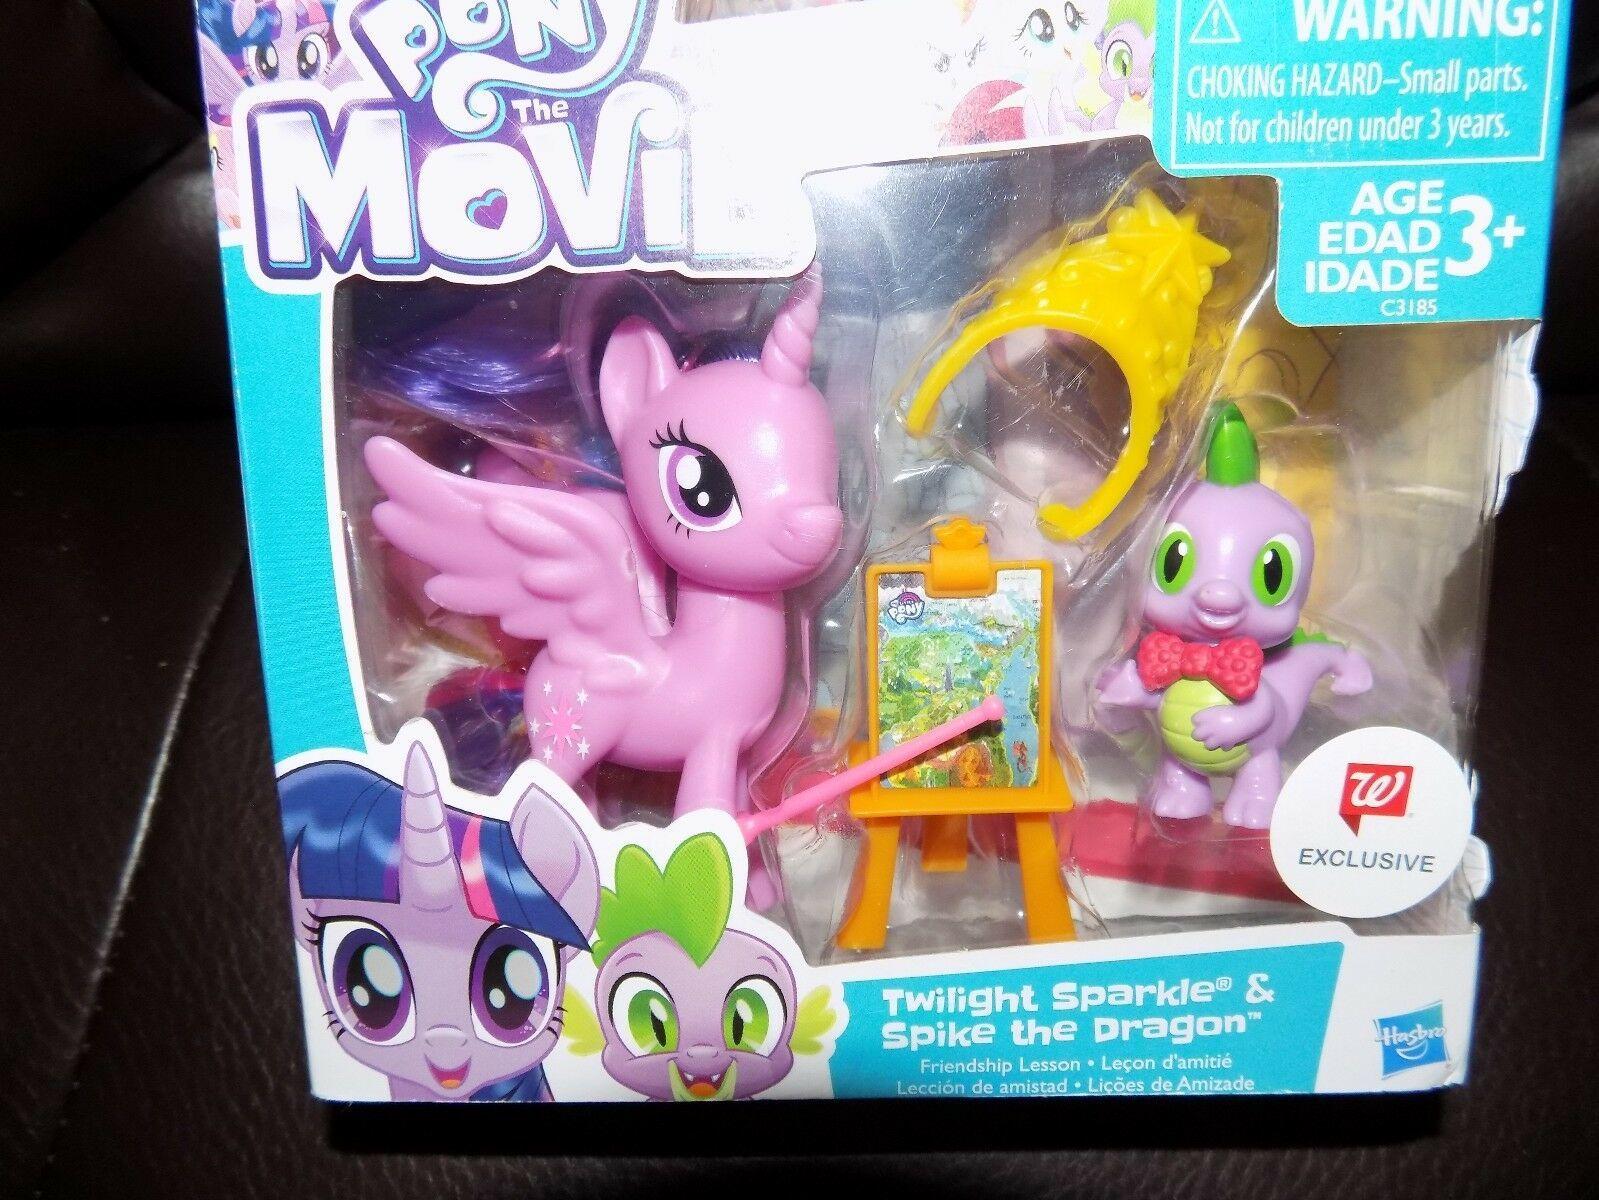 My Little Pony Twilight Sparkle Purple Horse Toy Walgreens